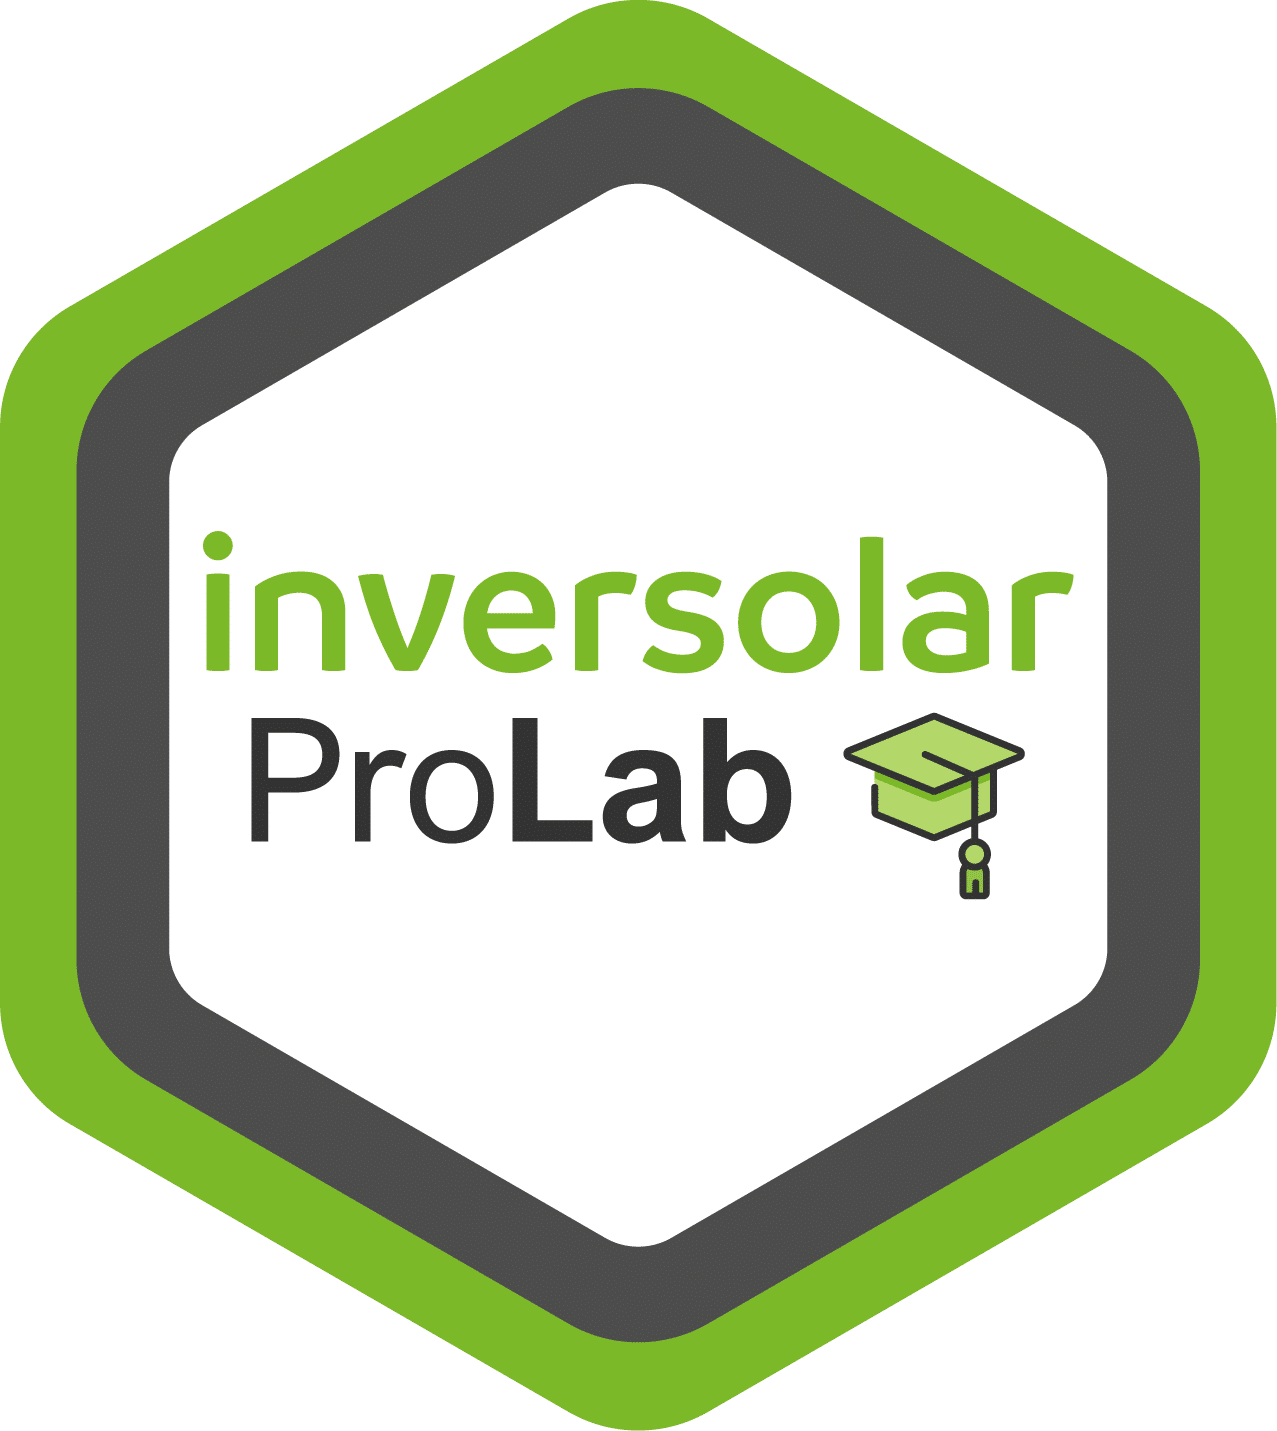 Inversolar PRO-LAB